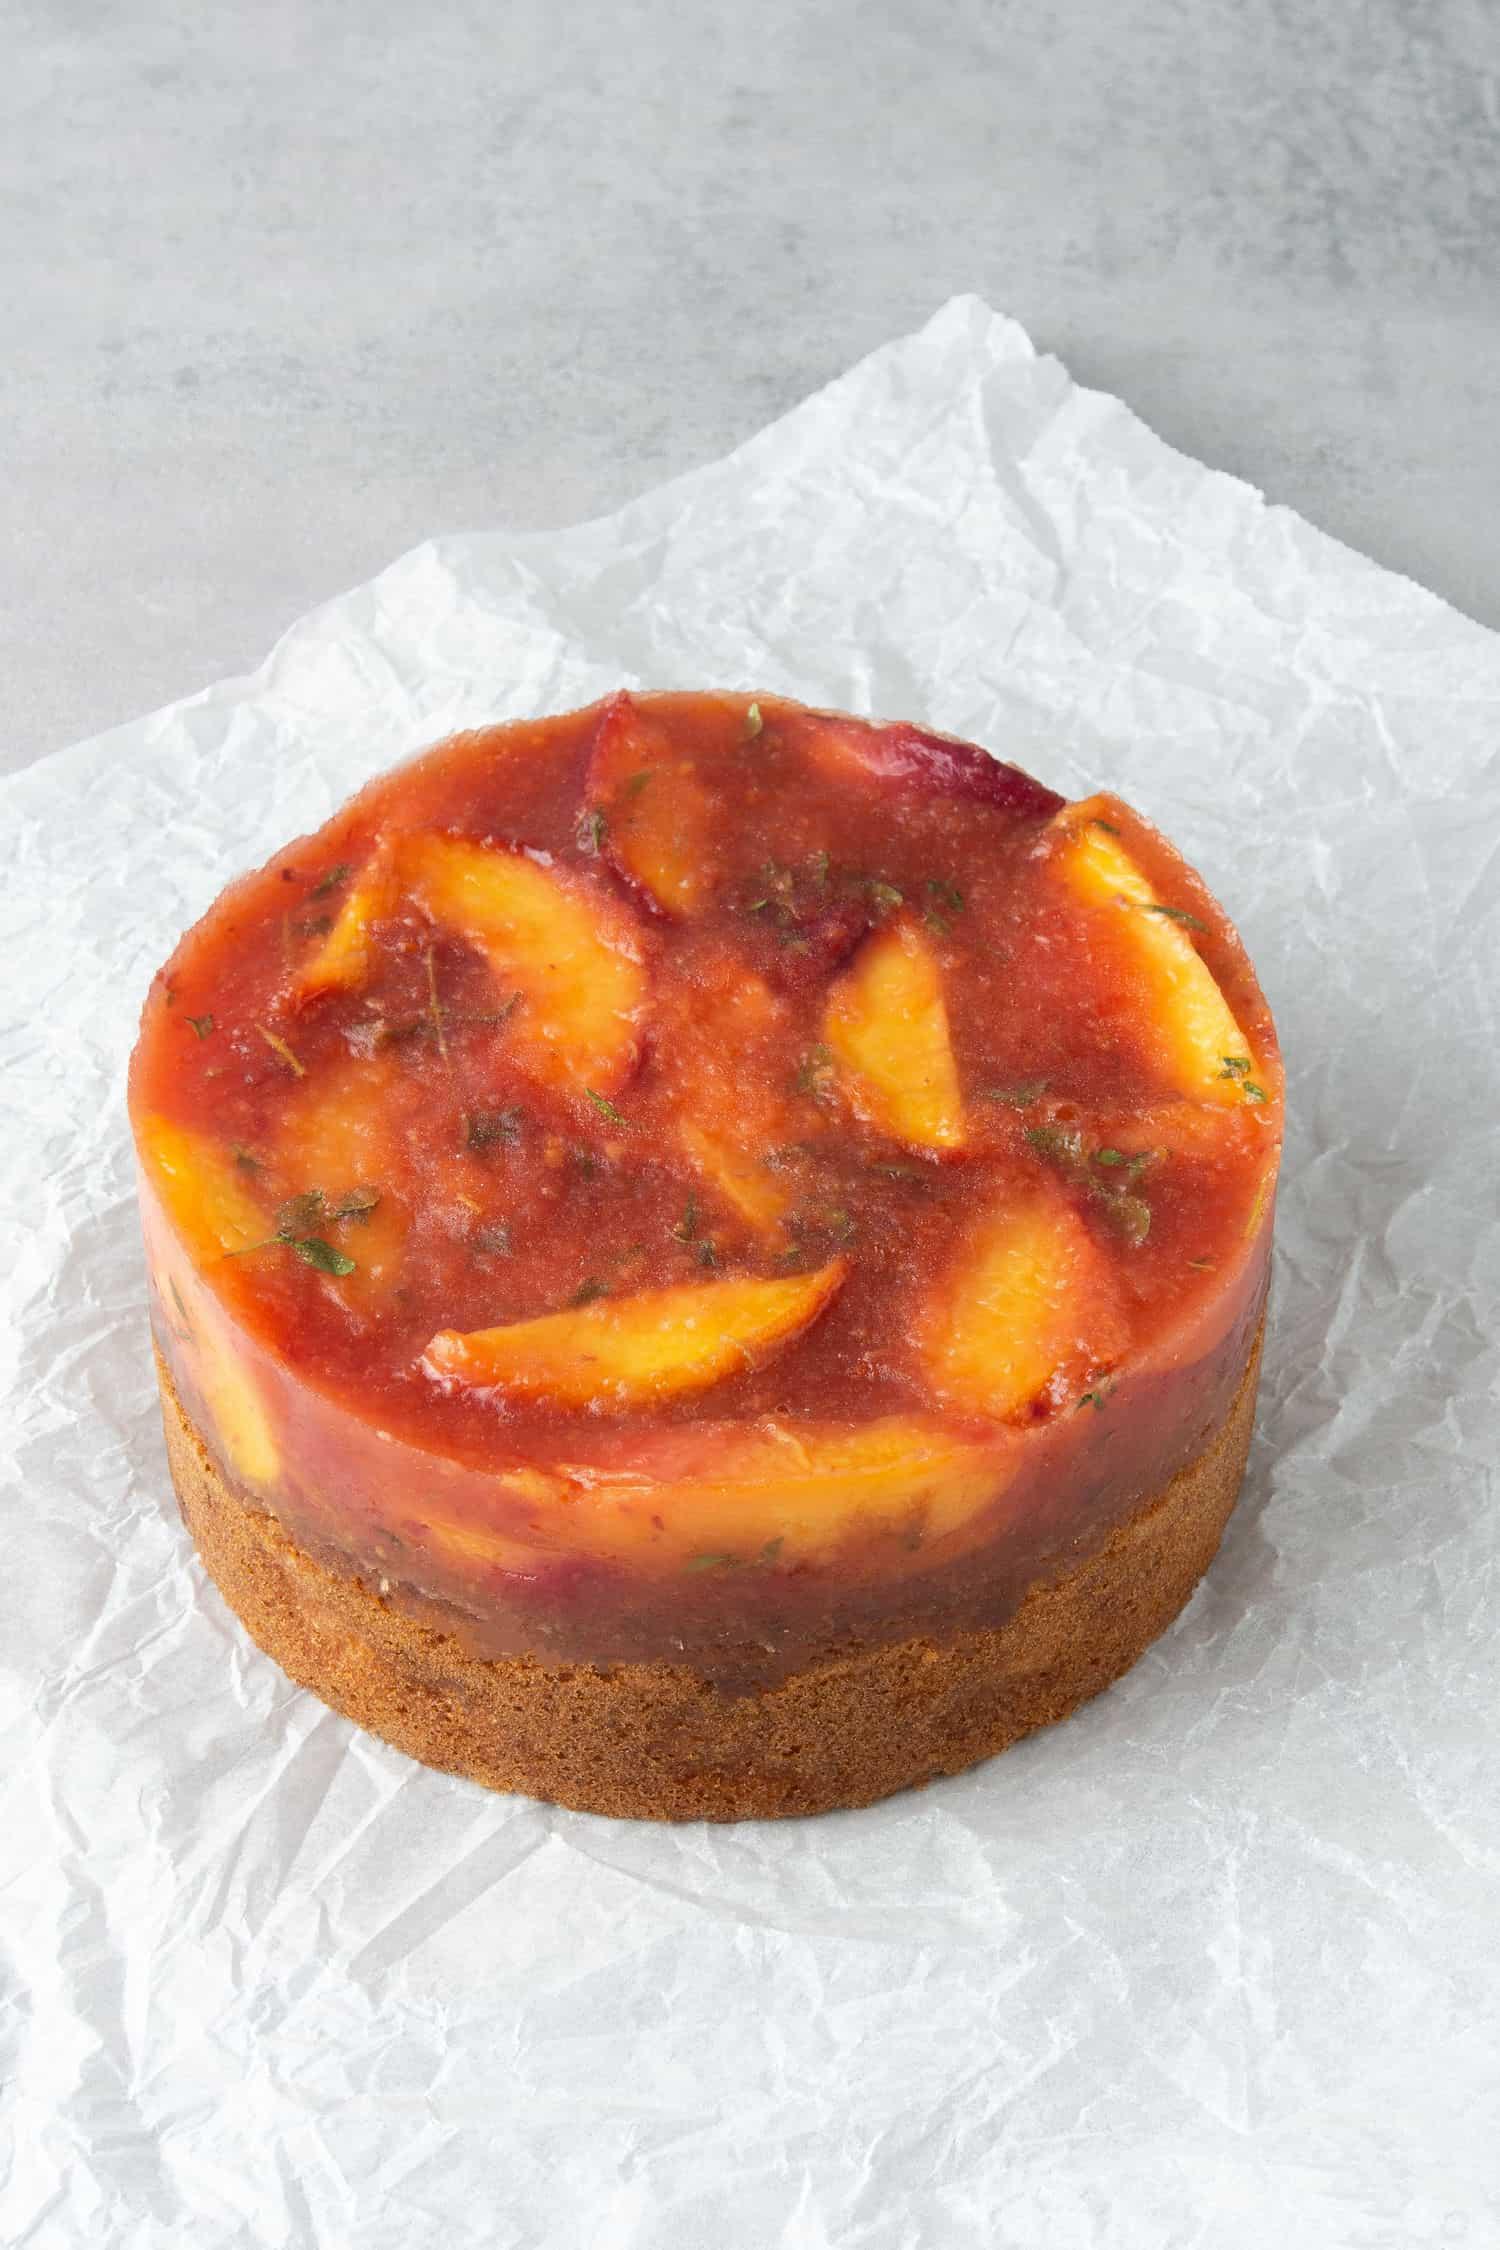 Peach cake process